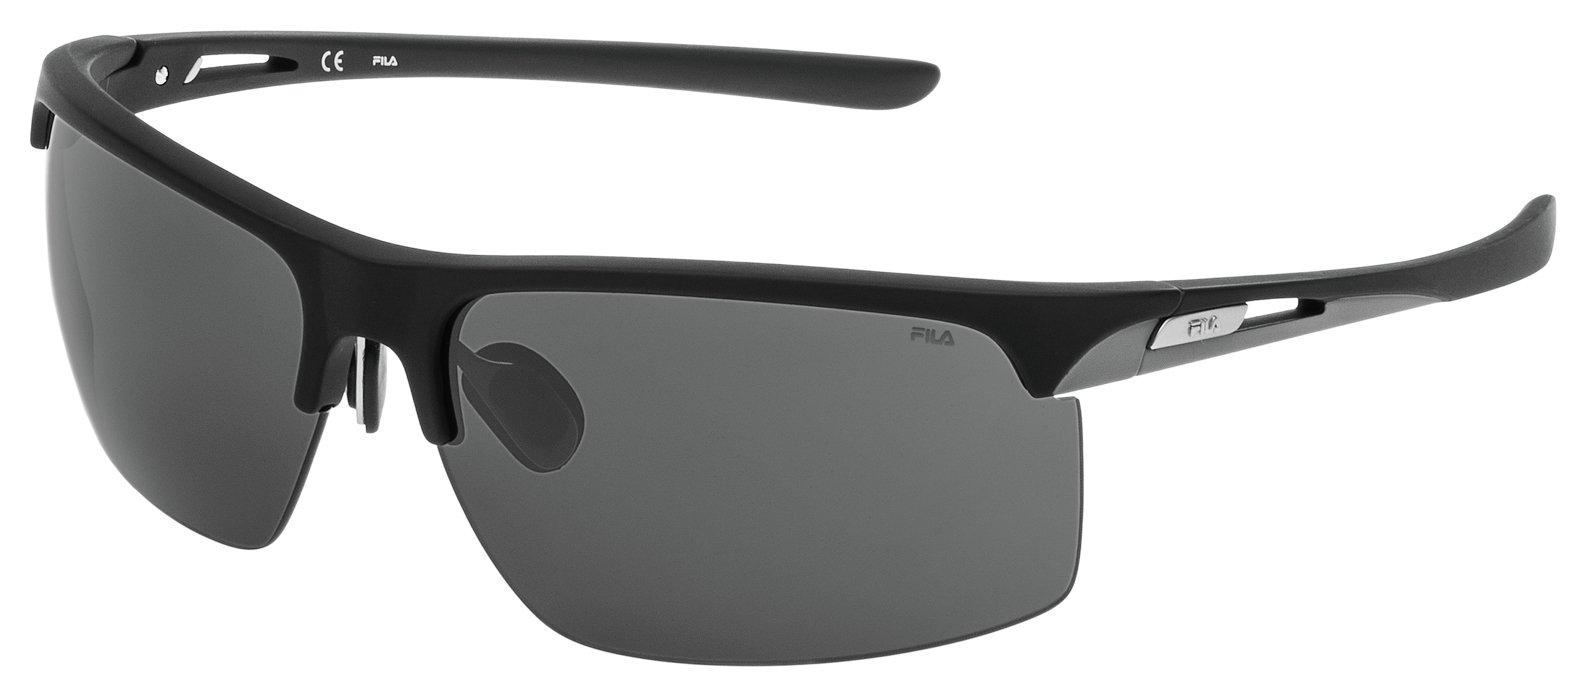 Image of Fila Matt Black Smoke Lens Sunglasses.